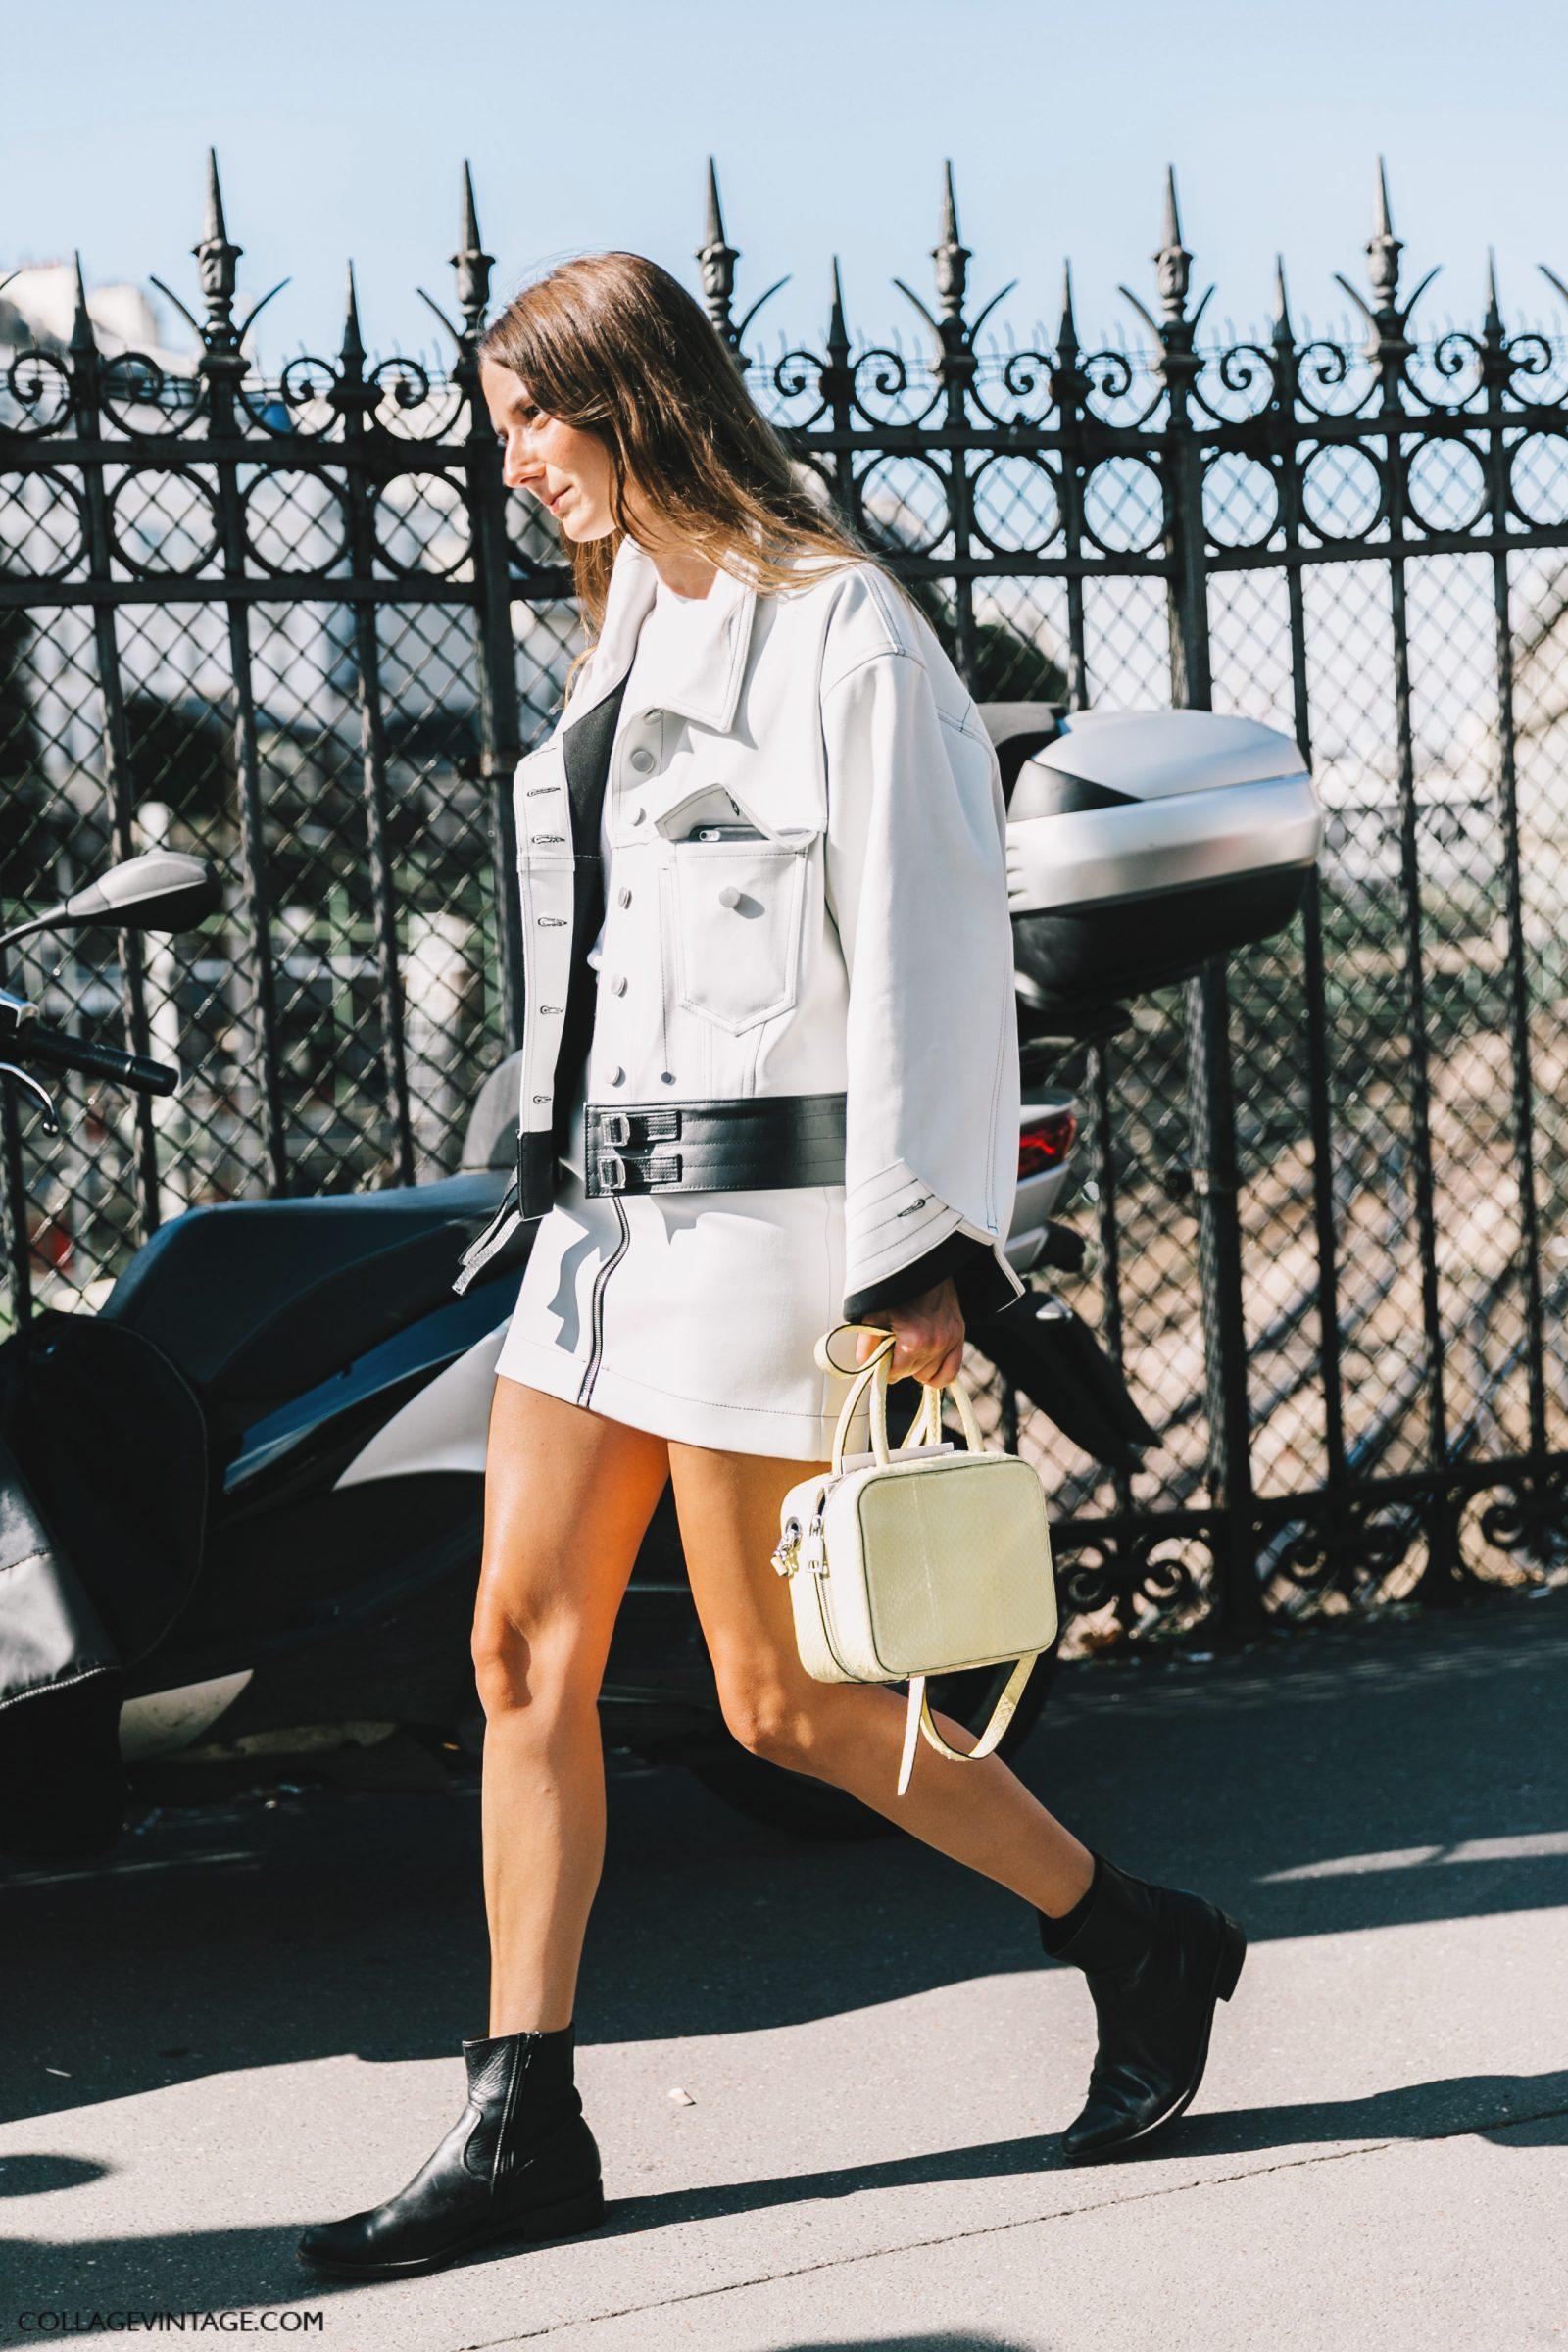 pfw-paris_fashion_week_ss17-street_style-outfits-collage_vintage-rochas-courreges-dries_van_noten-lanvin-guy_laroche-180